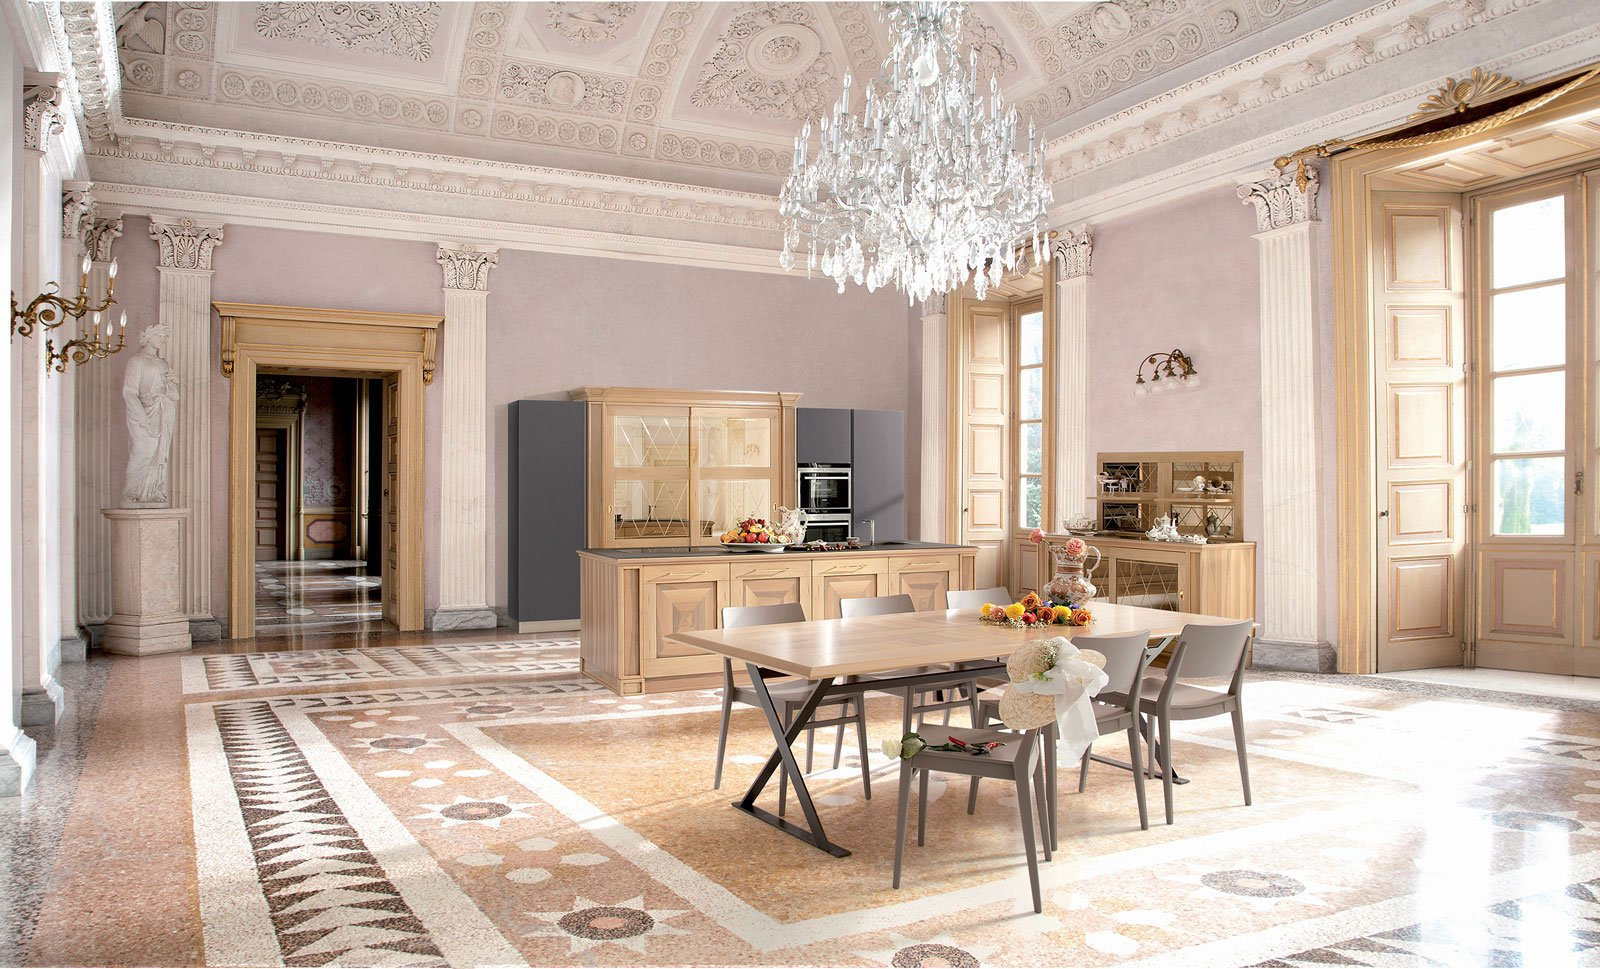 Cucine classiche in legno o laccate cose di casa for Cucine immagini